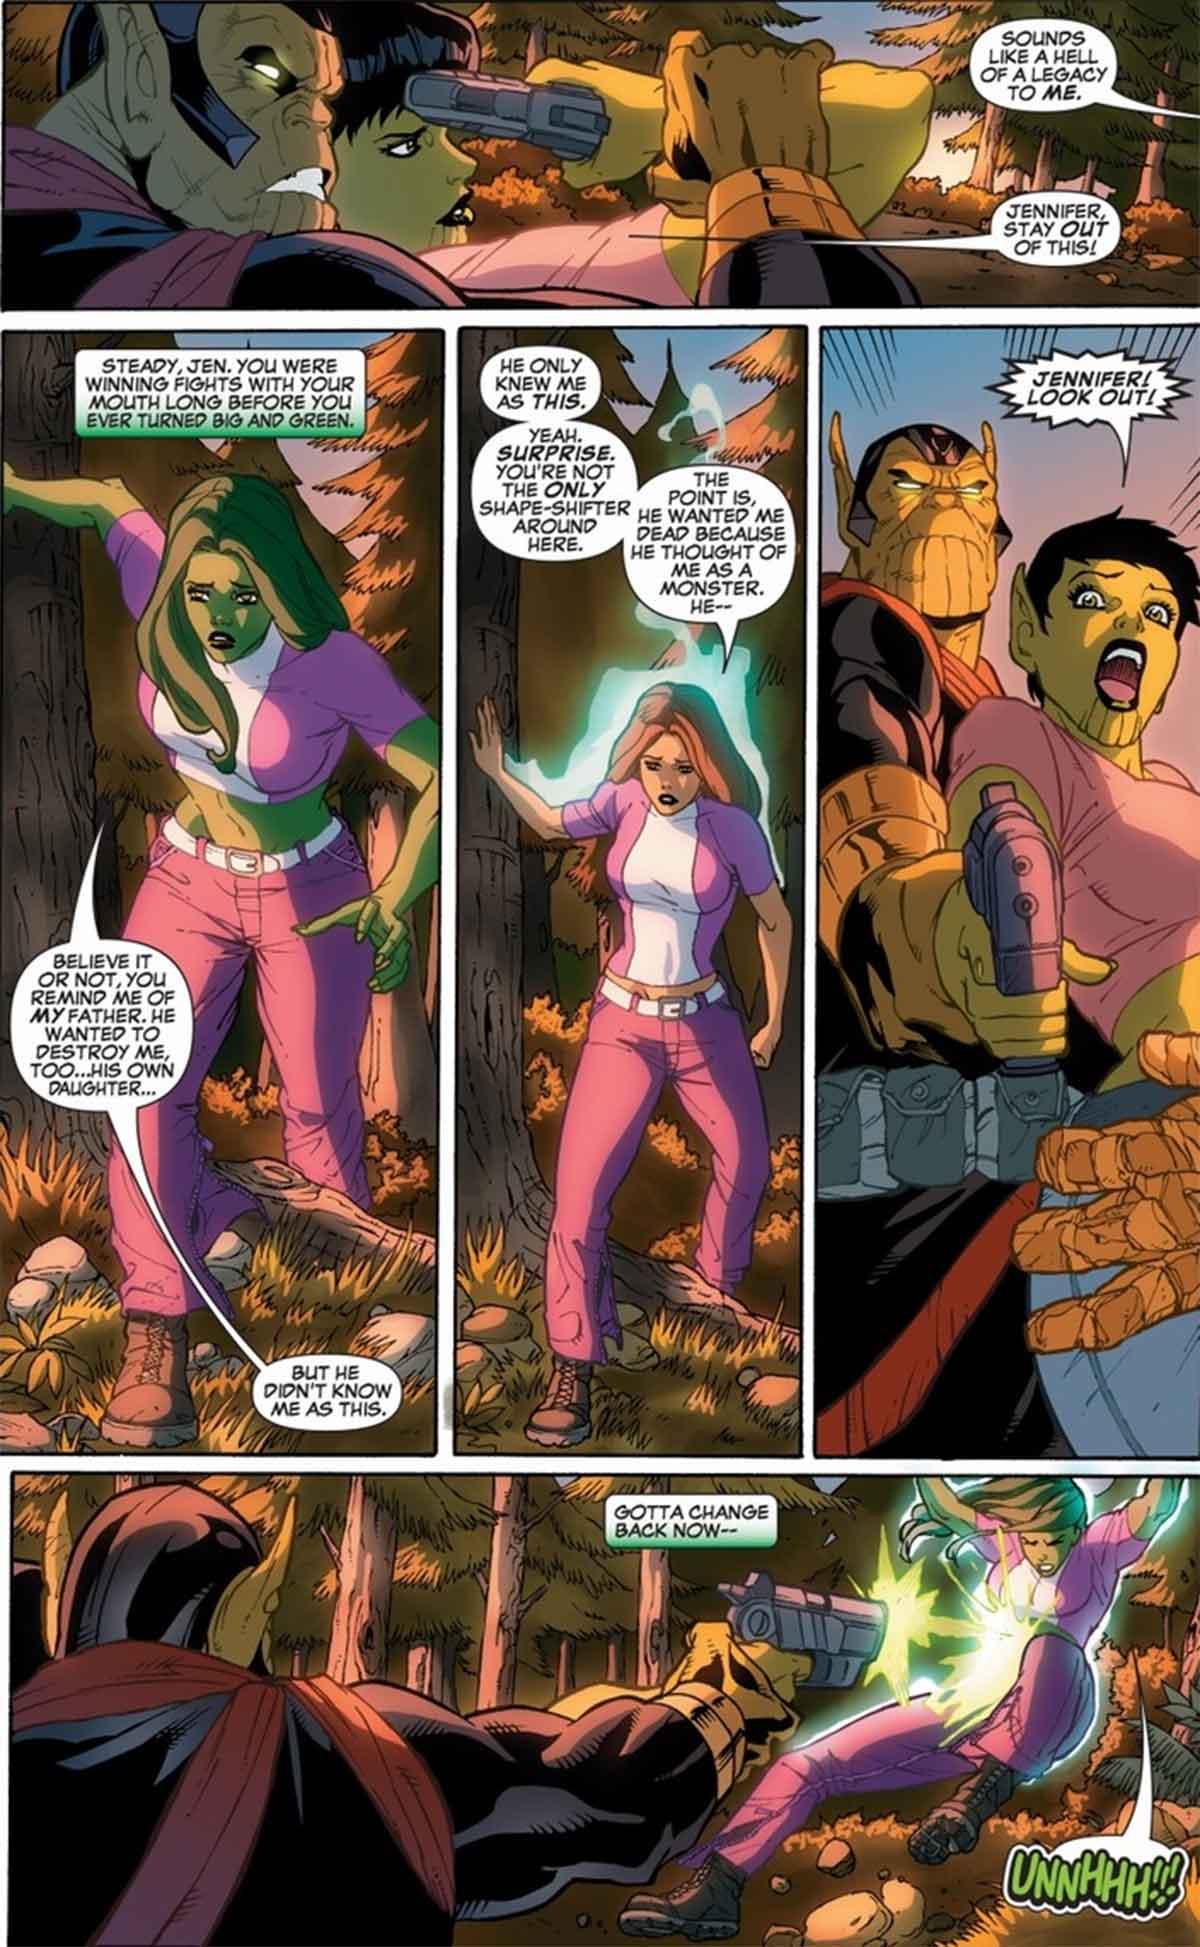 Los Skrull serán importantes en la serie She-Hulk de Marvel Studios